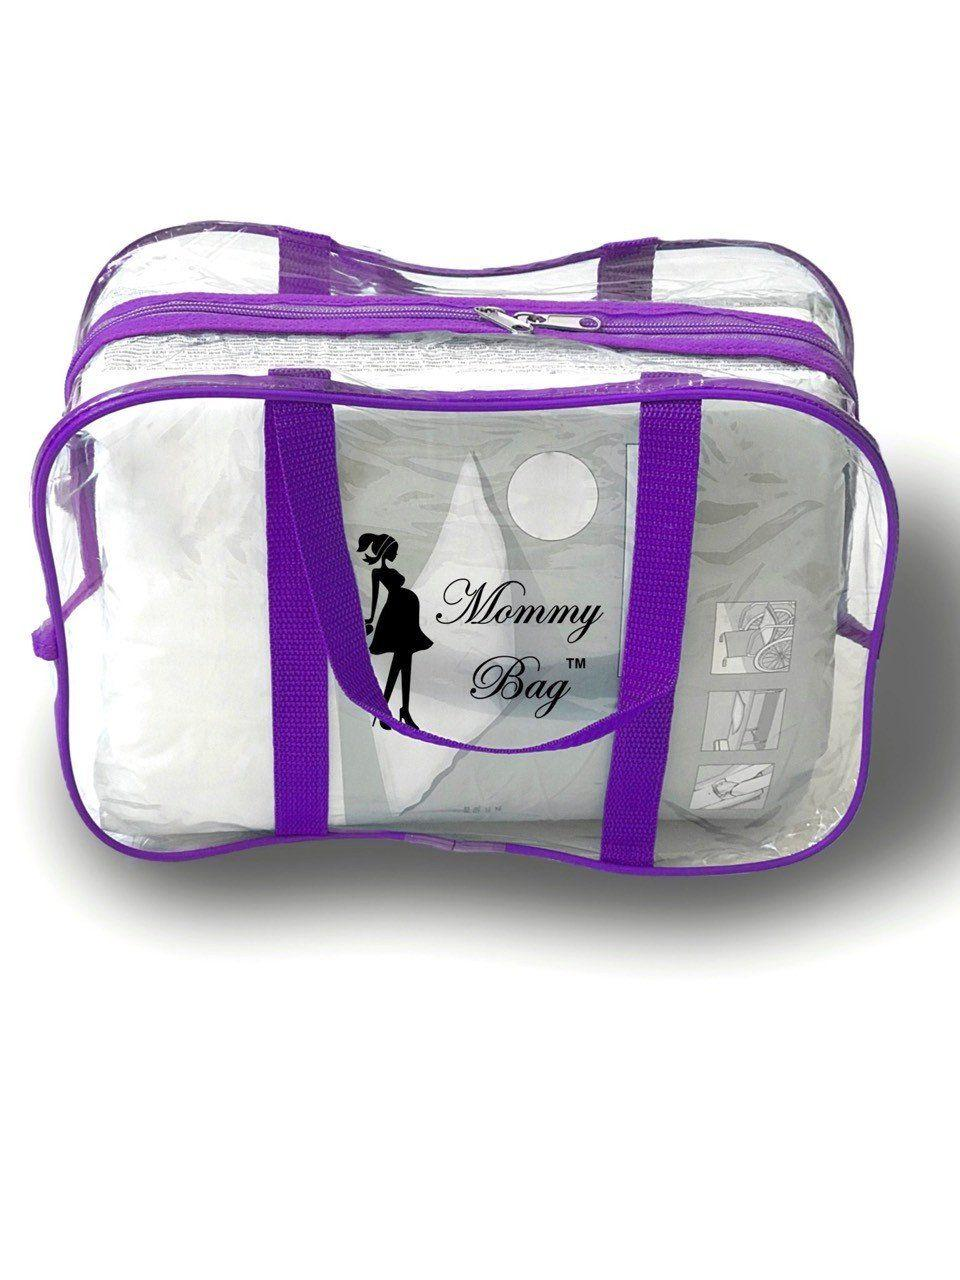 Сумка прозрачная в роддом Mommy Bag, размер - S, цвет - Фиолетовый.